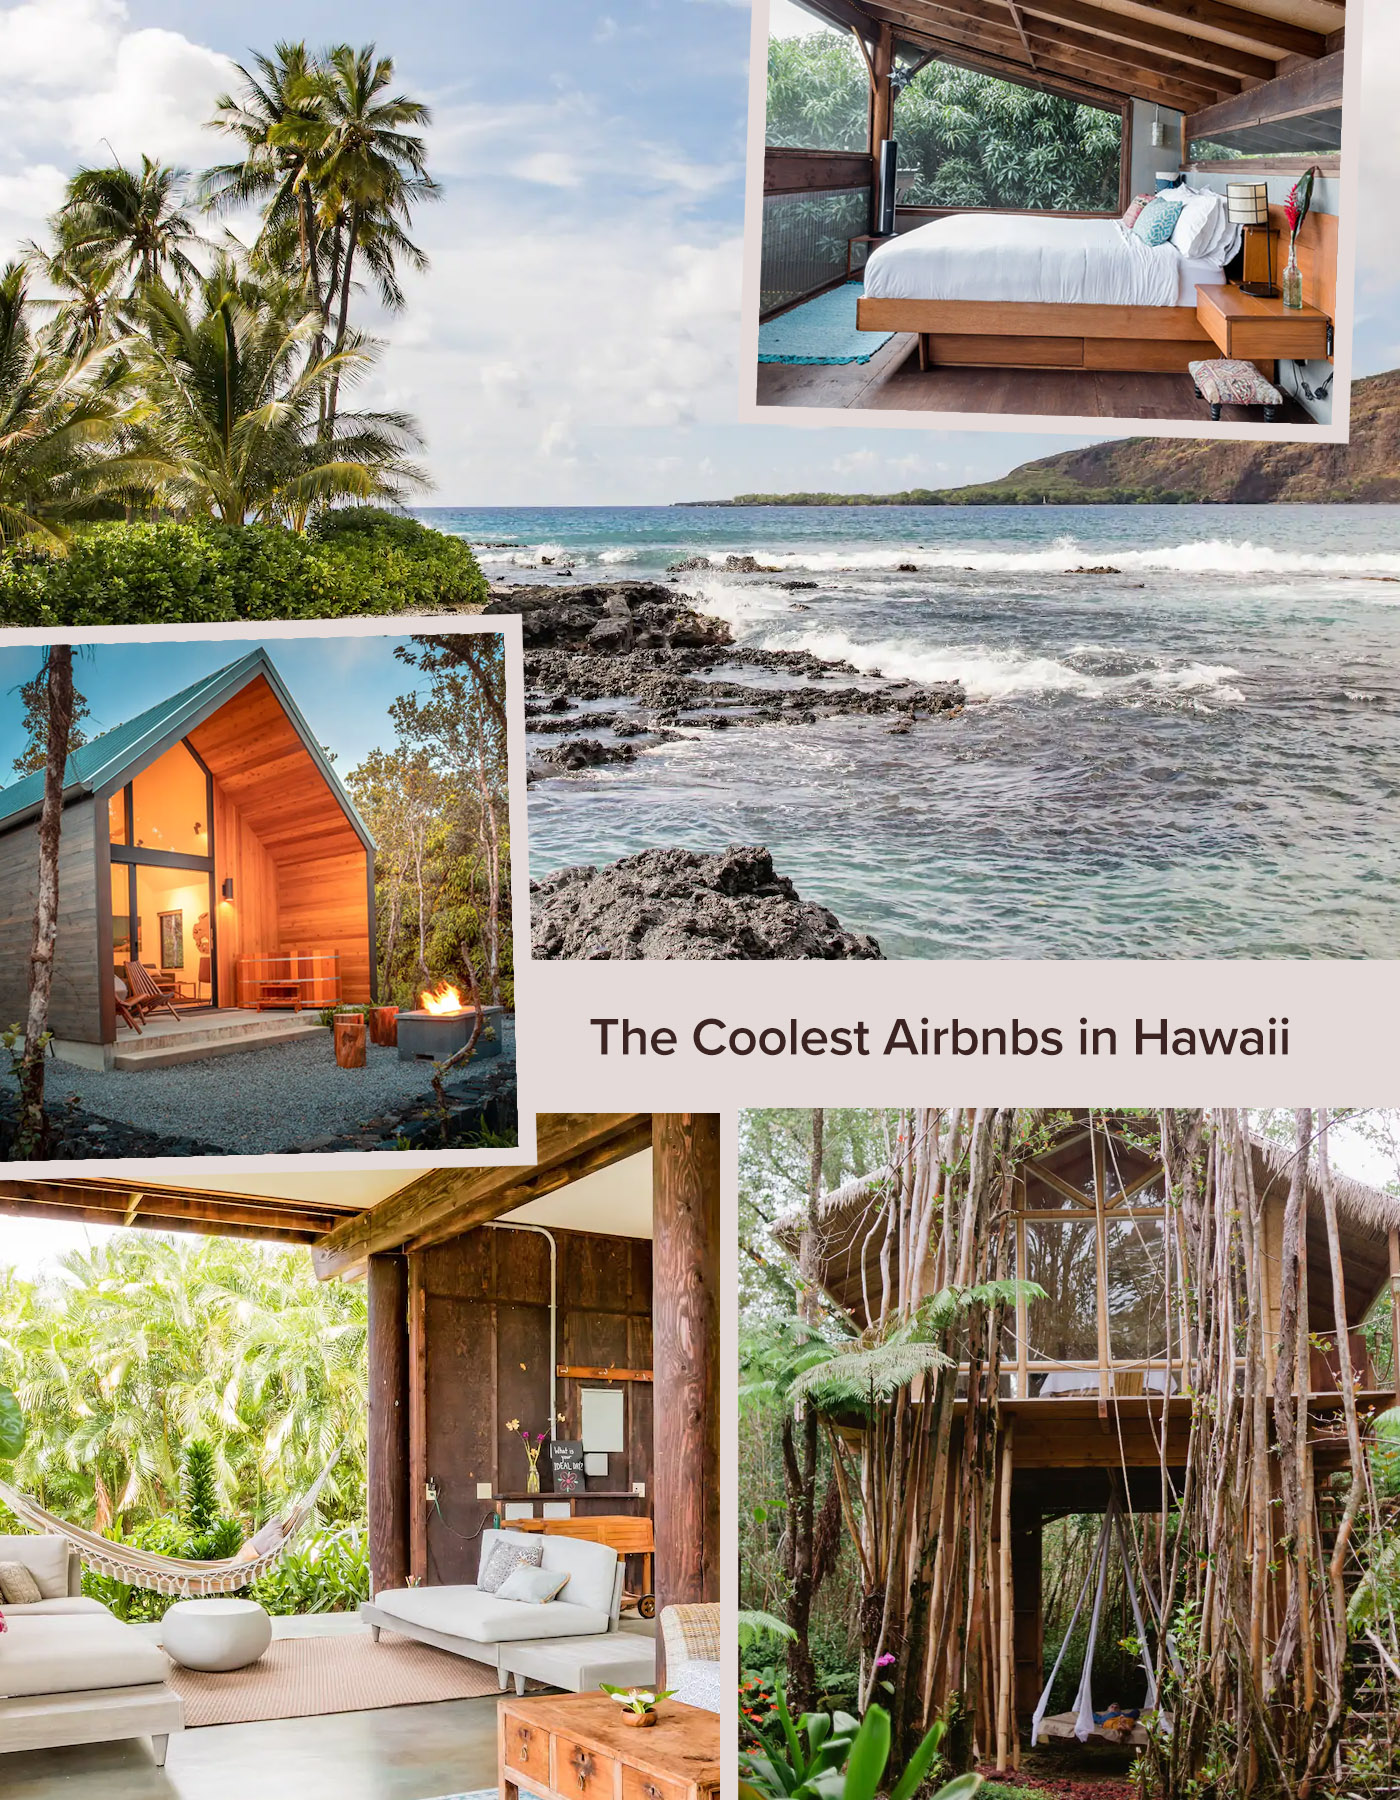 coolest hawaii airbnbs in maui, the big island, oahu and kauai